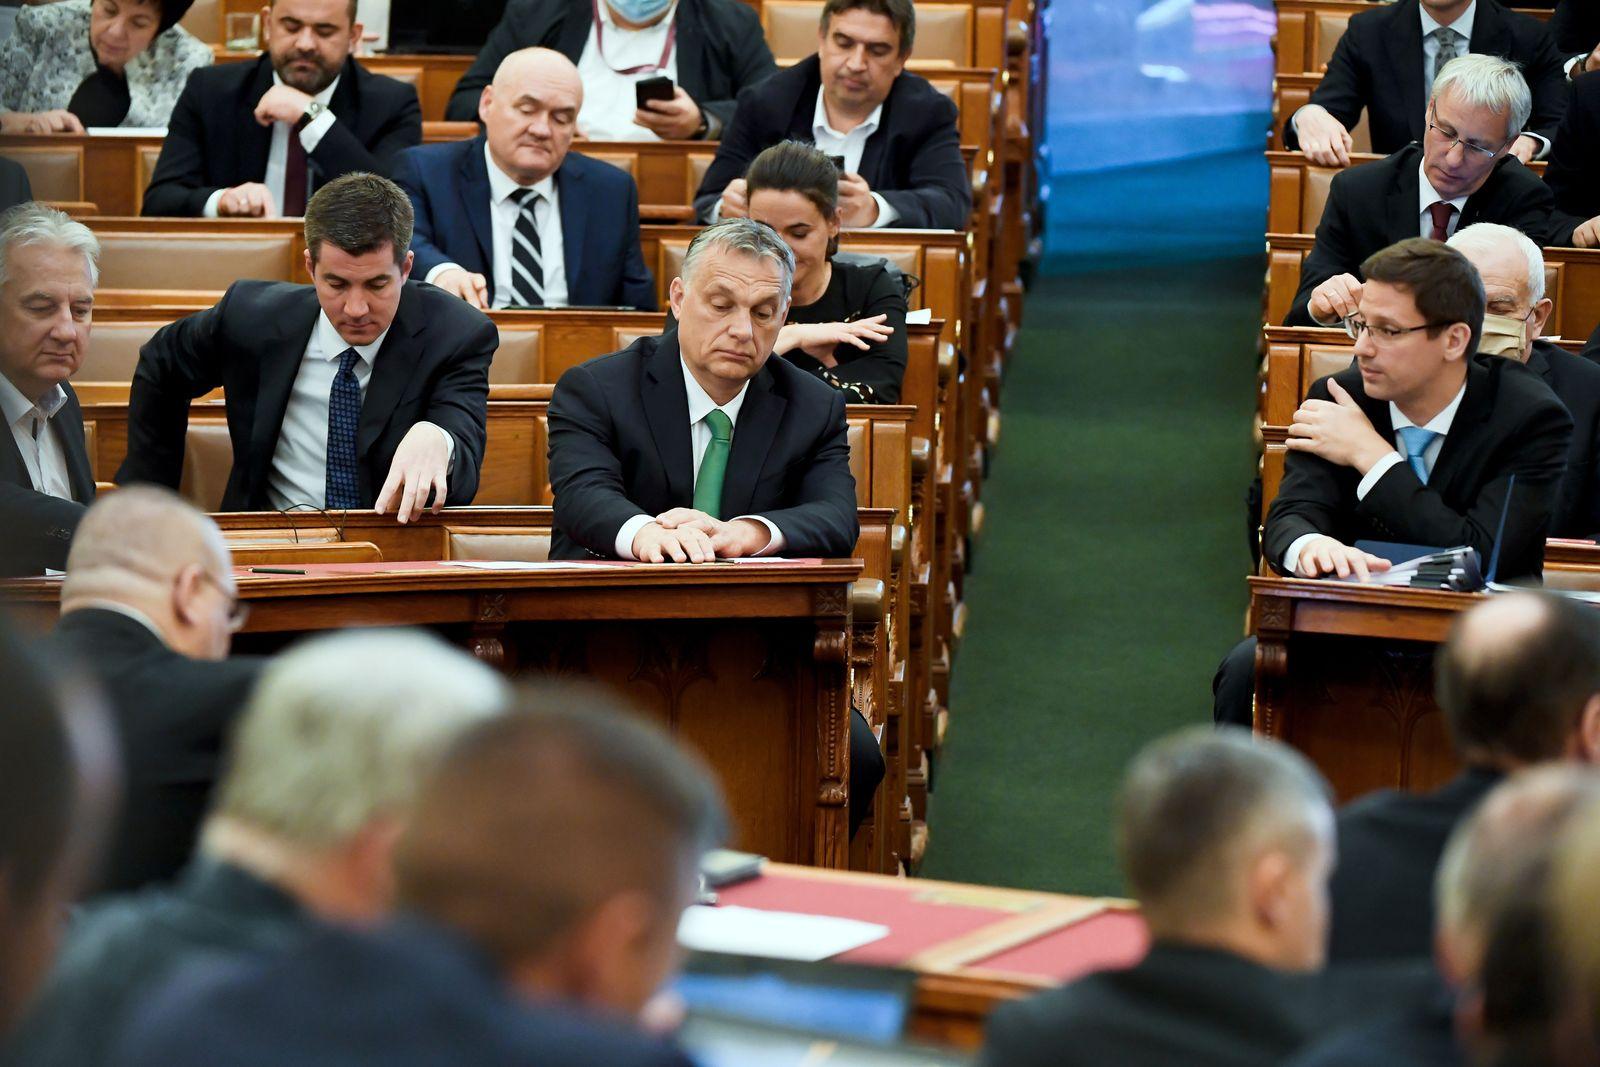 Plenary session of the Parliament, Budapest, Hungary - 06 Apr 2020